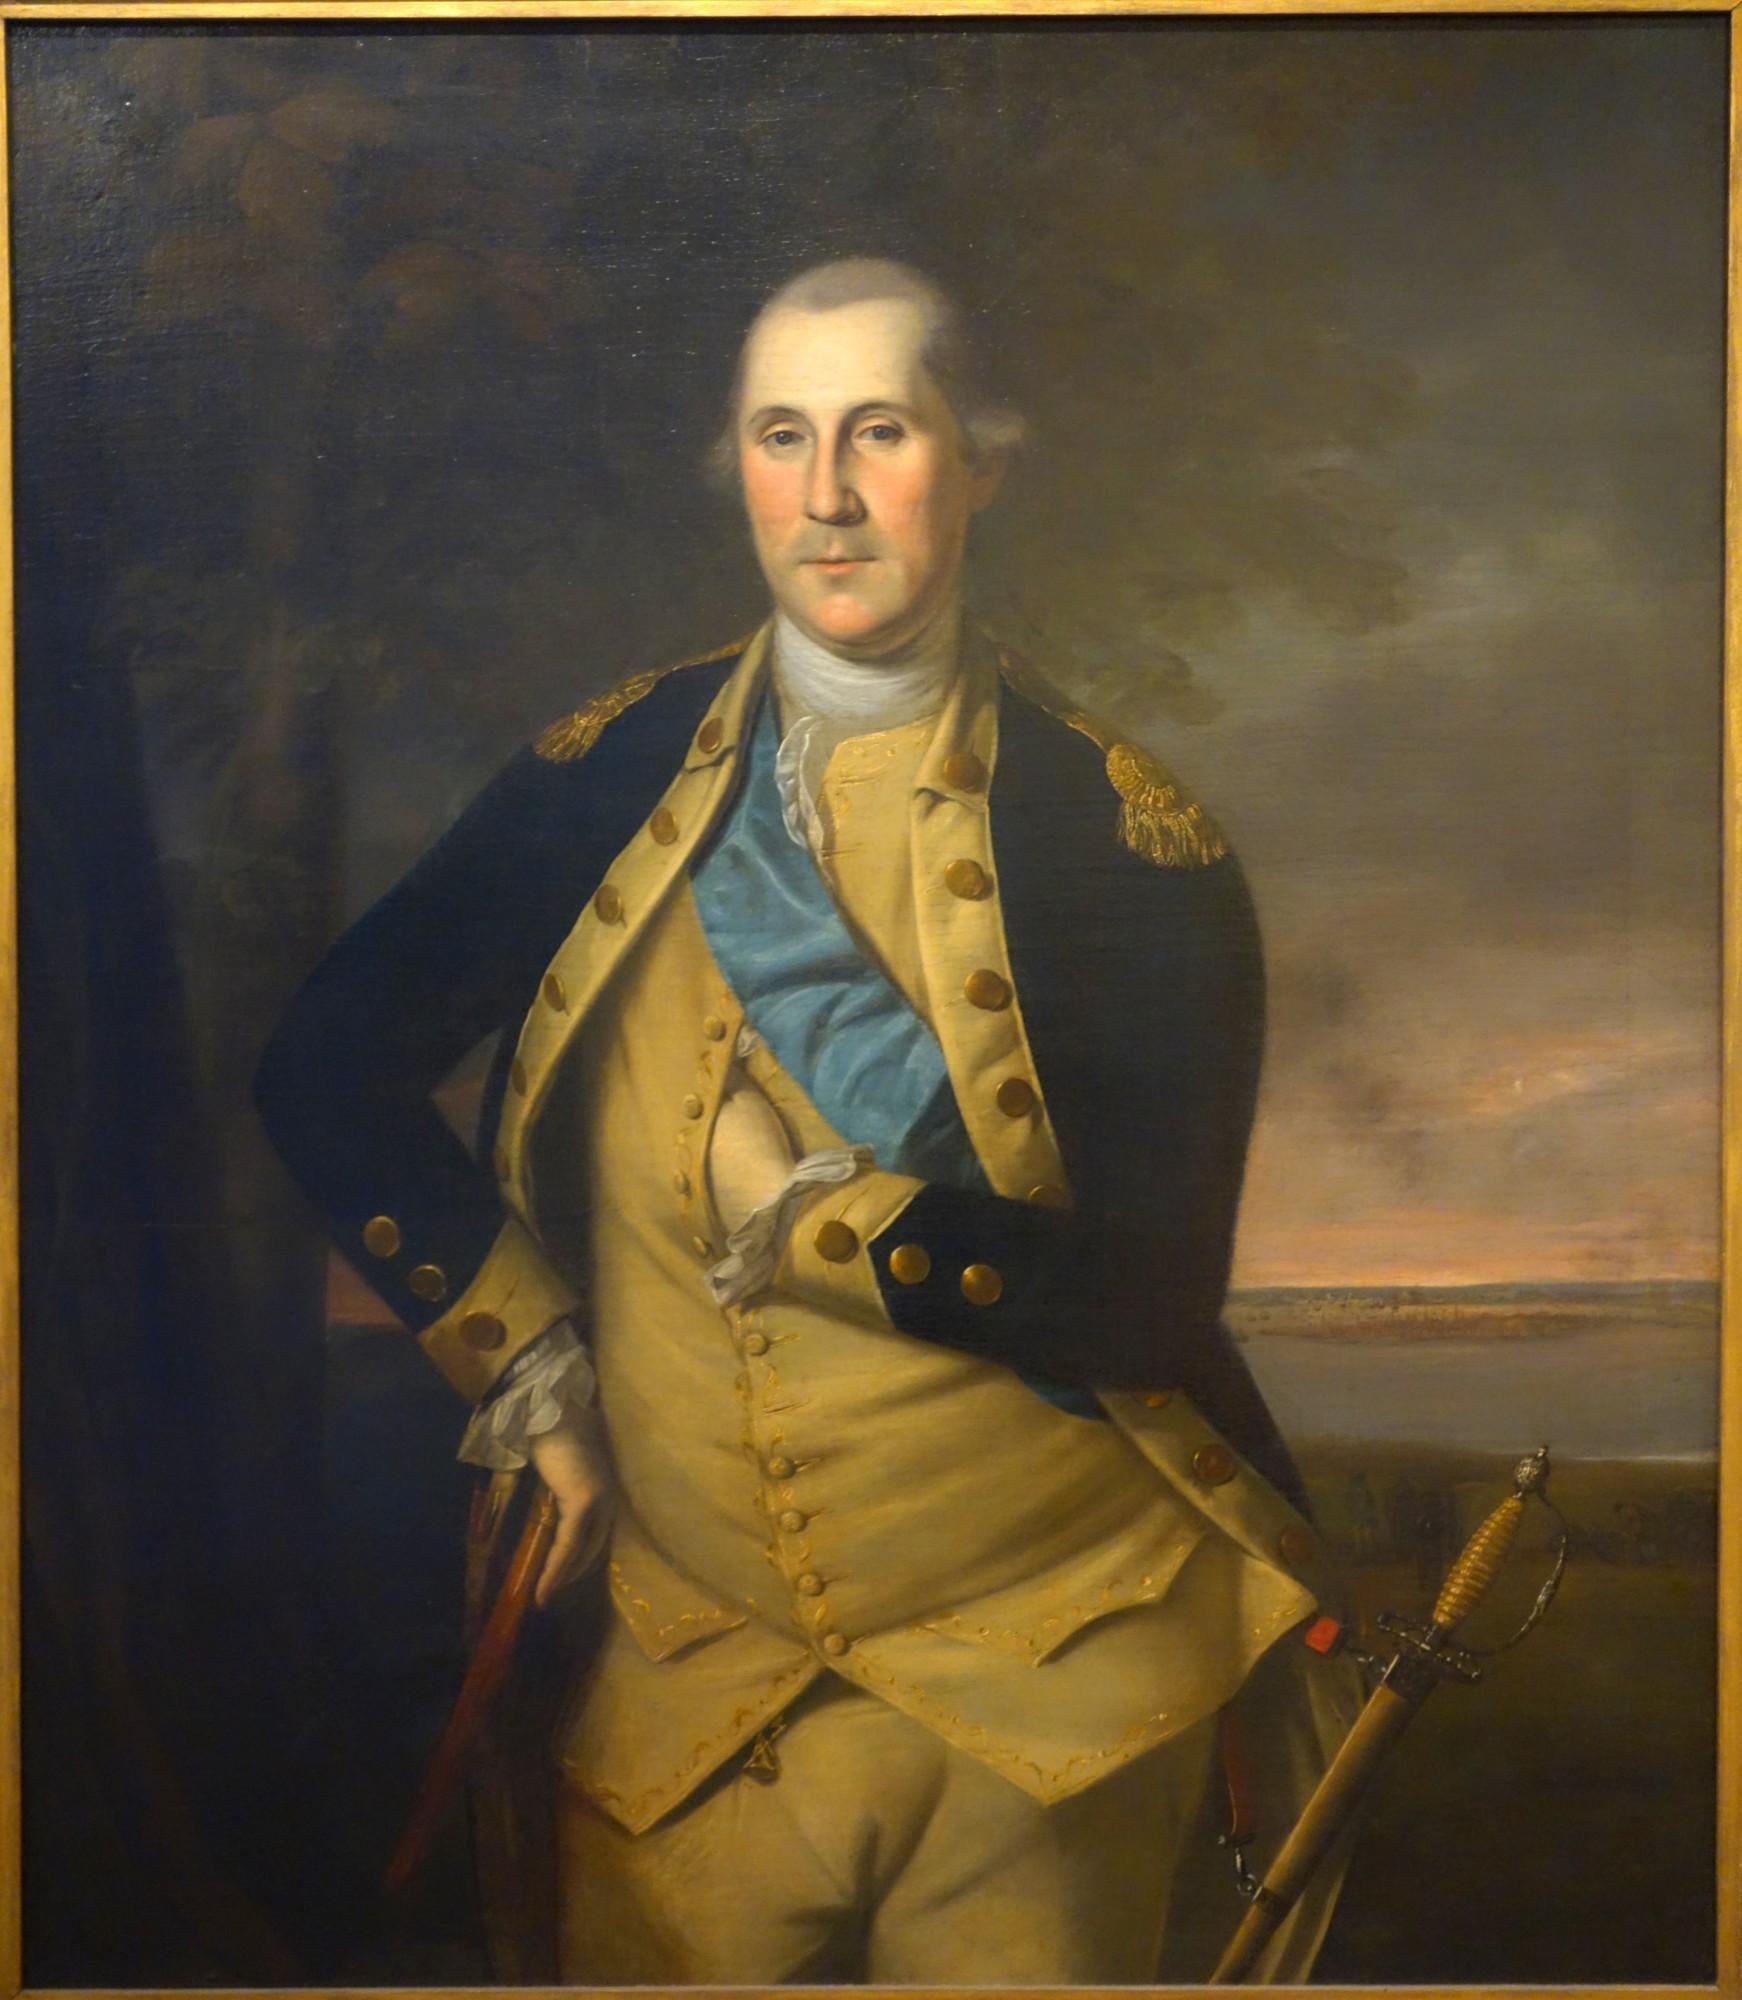 A History Of Washington S Dental Troubles George